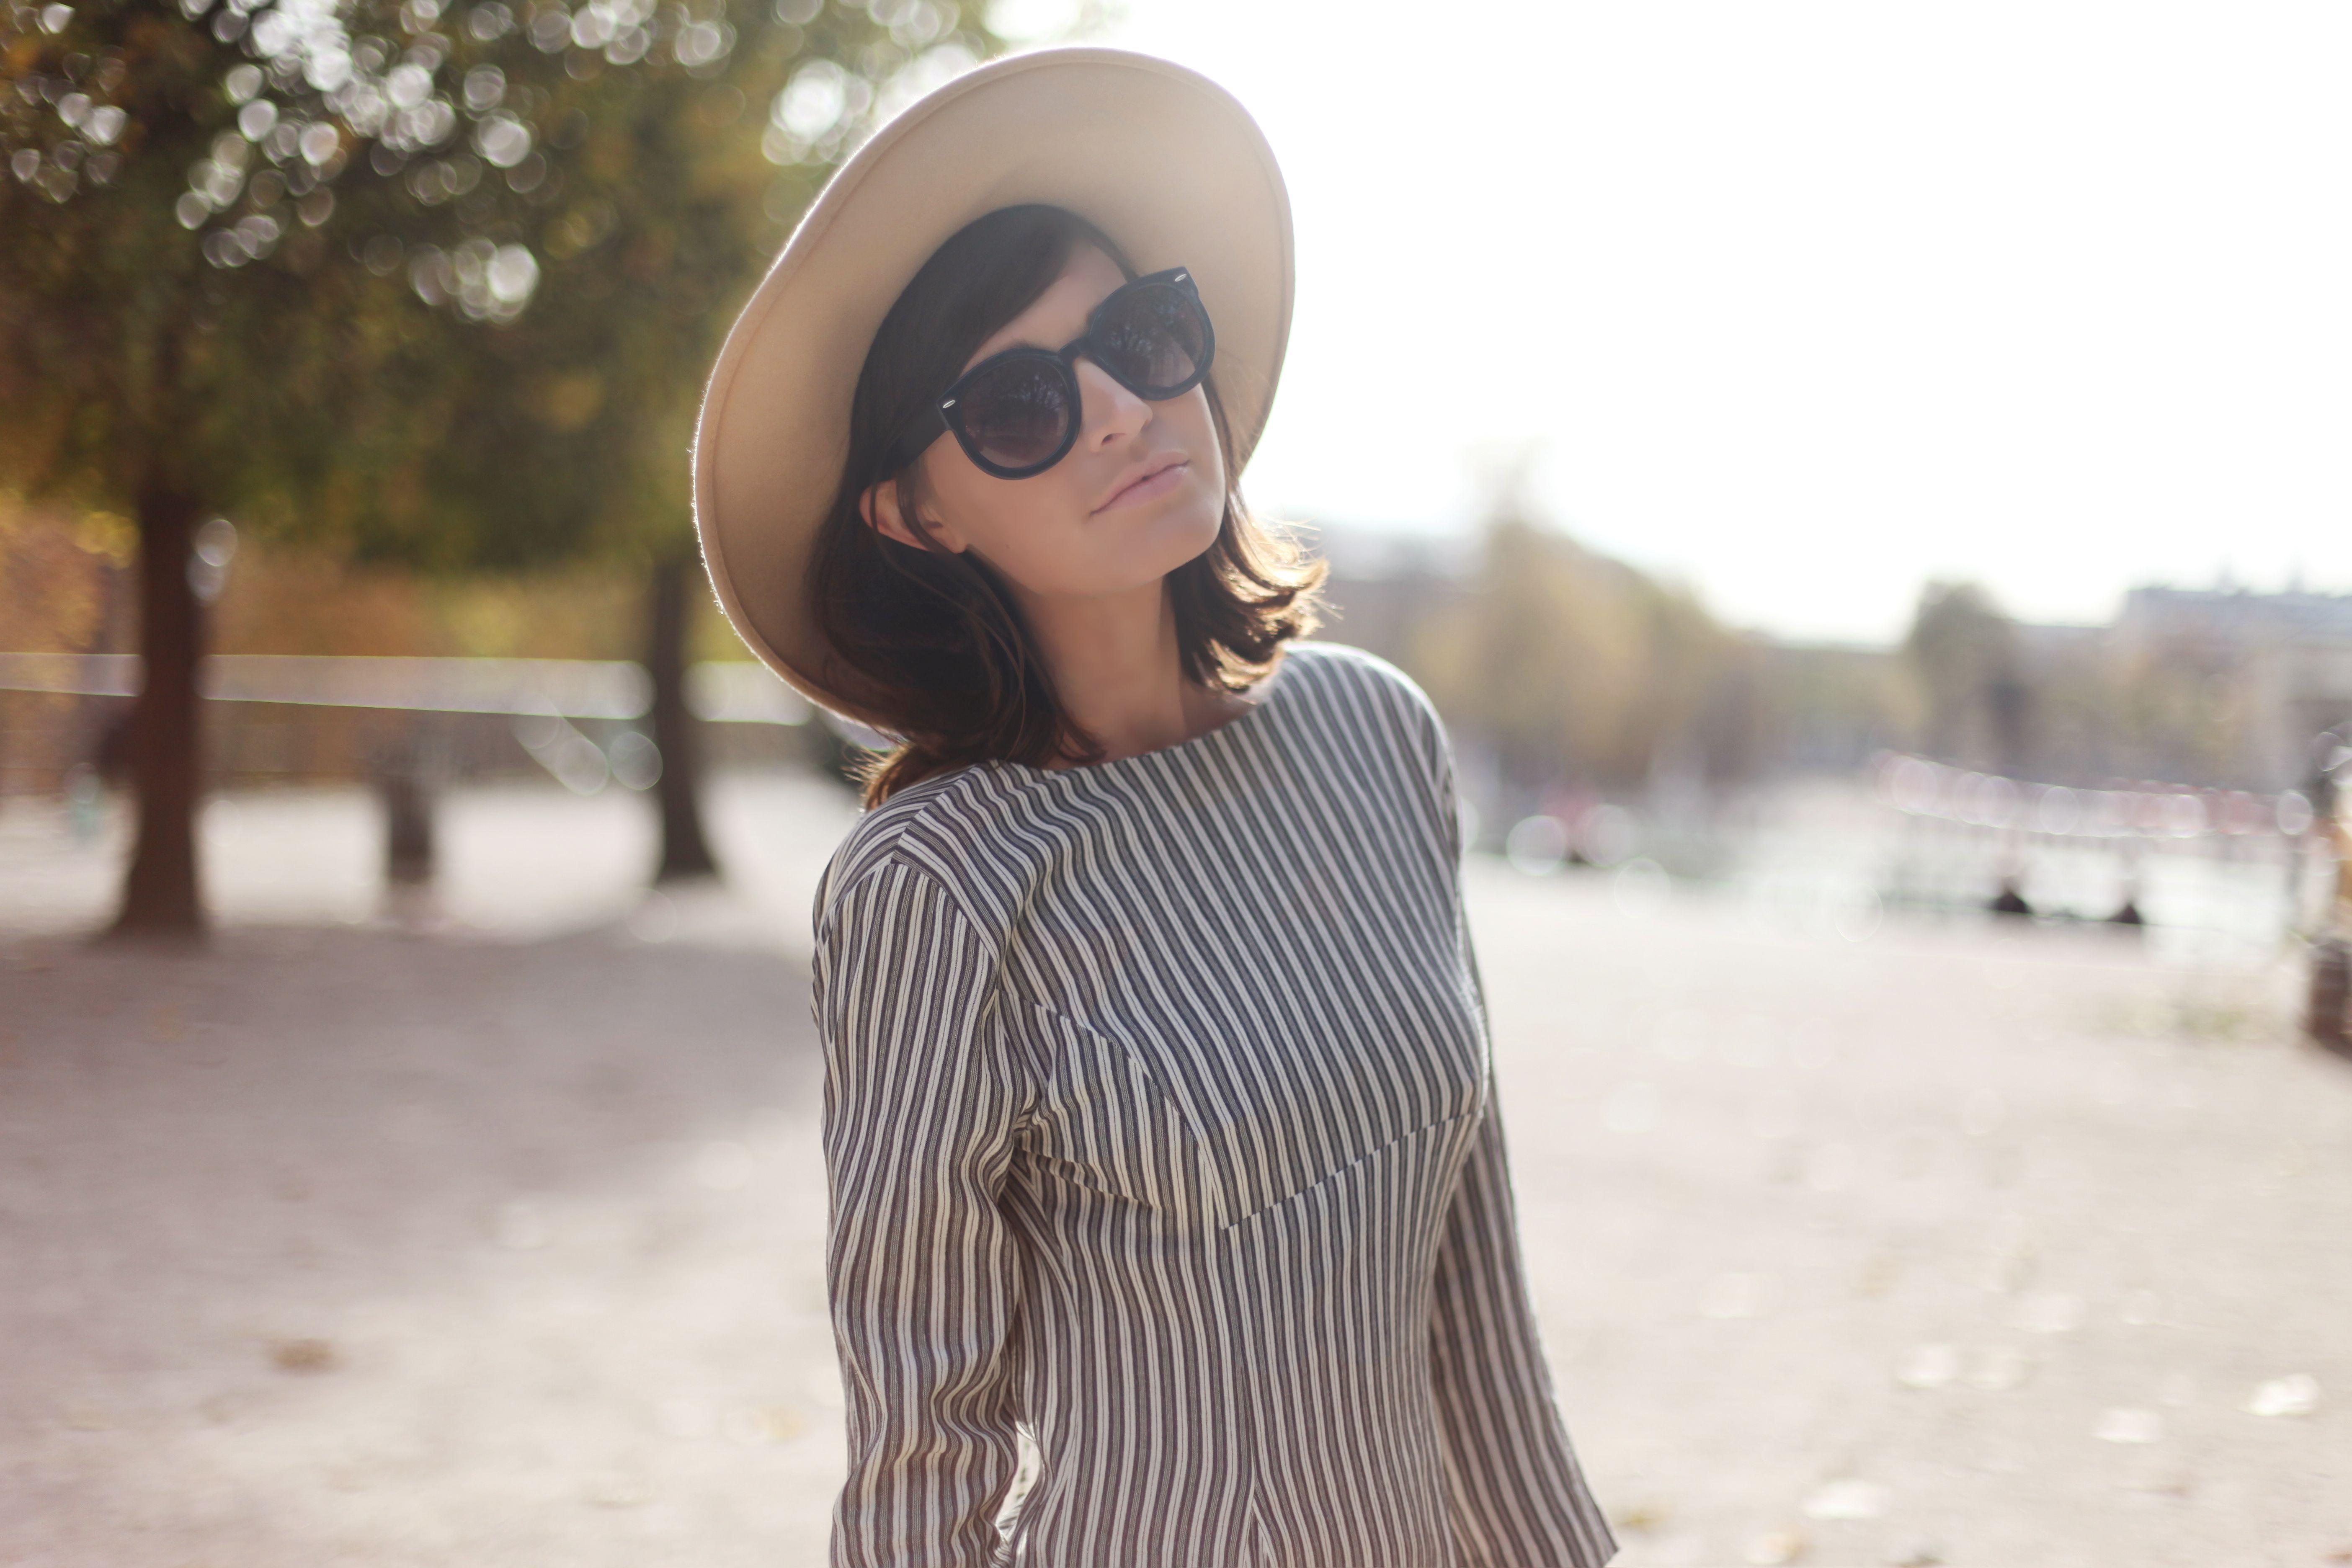 c1a4f06502b Fashion · Be Frassy  WOMENS DESIGNER ROUND OVERSIZE RETRO FASHION  SUNGLASSES 8623